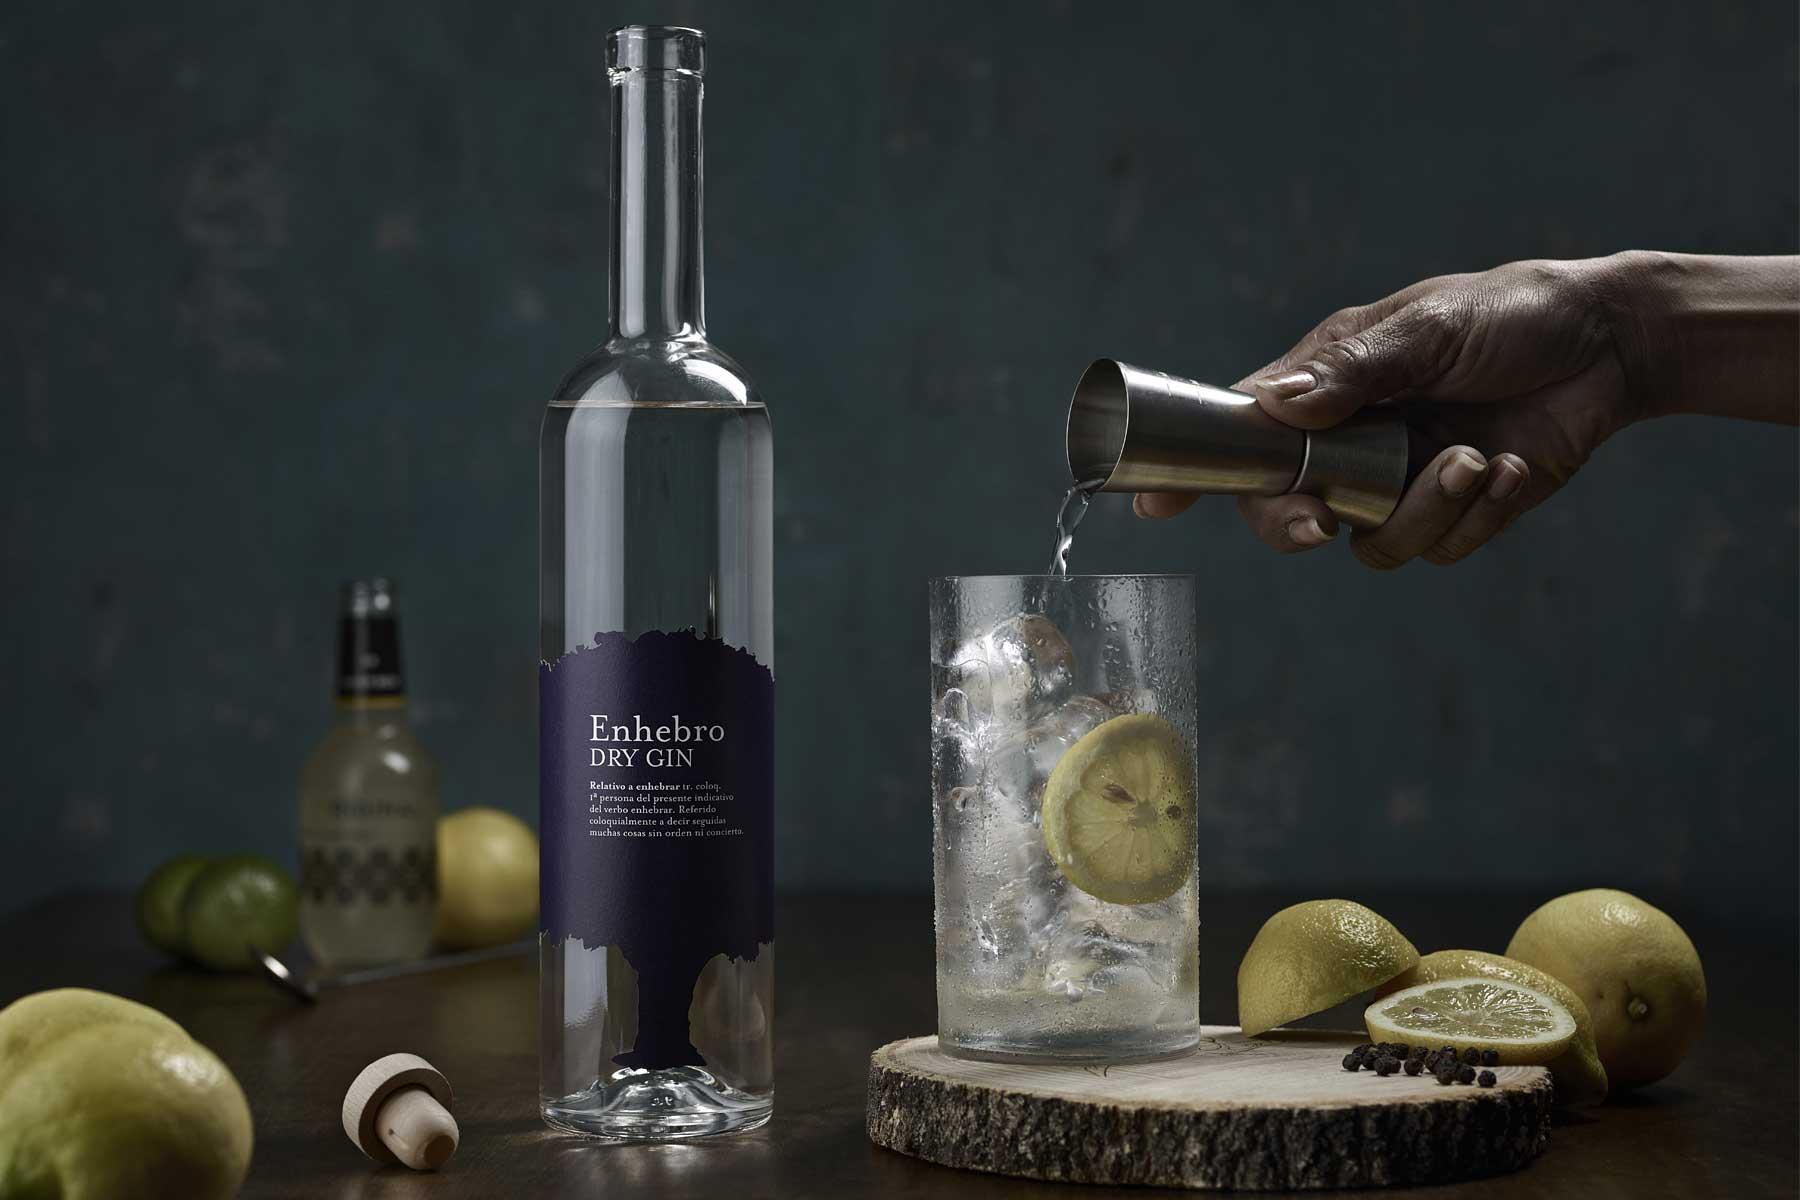 Enhebro Dry Gin